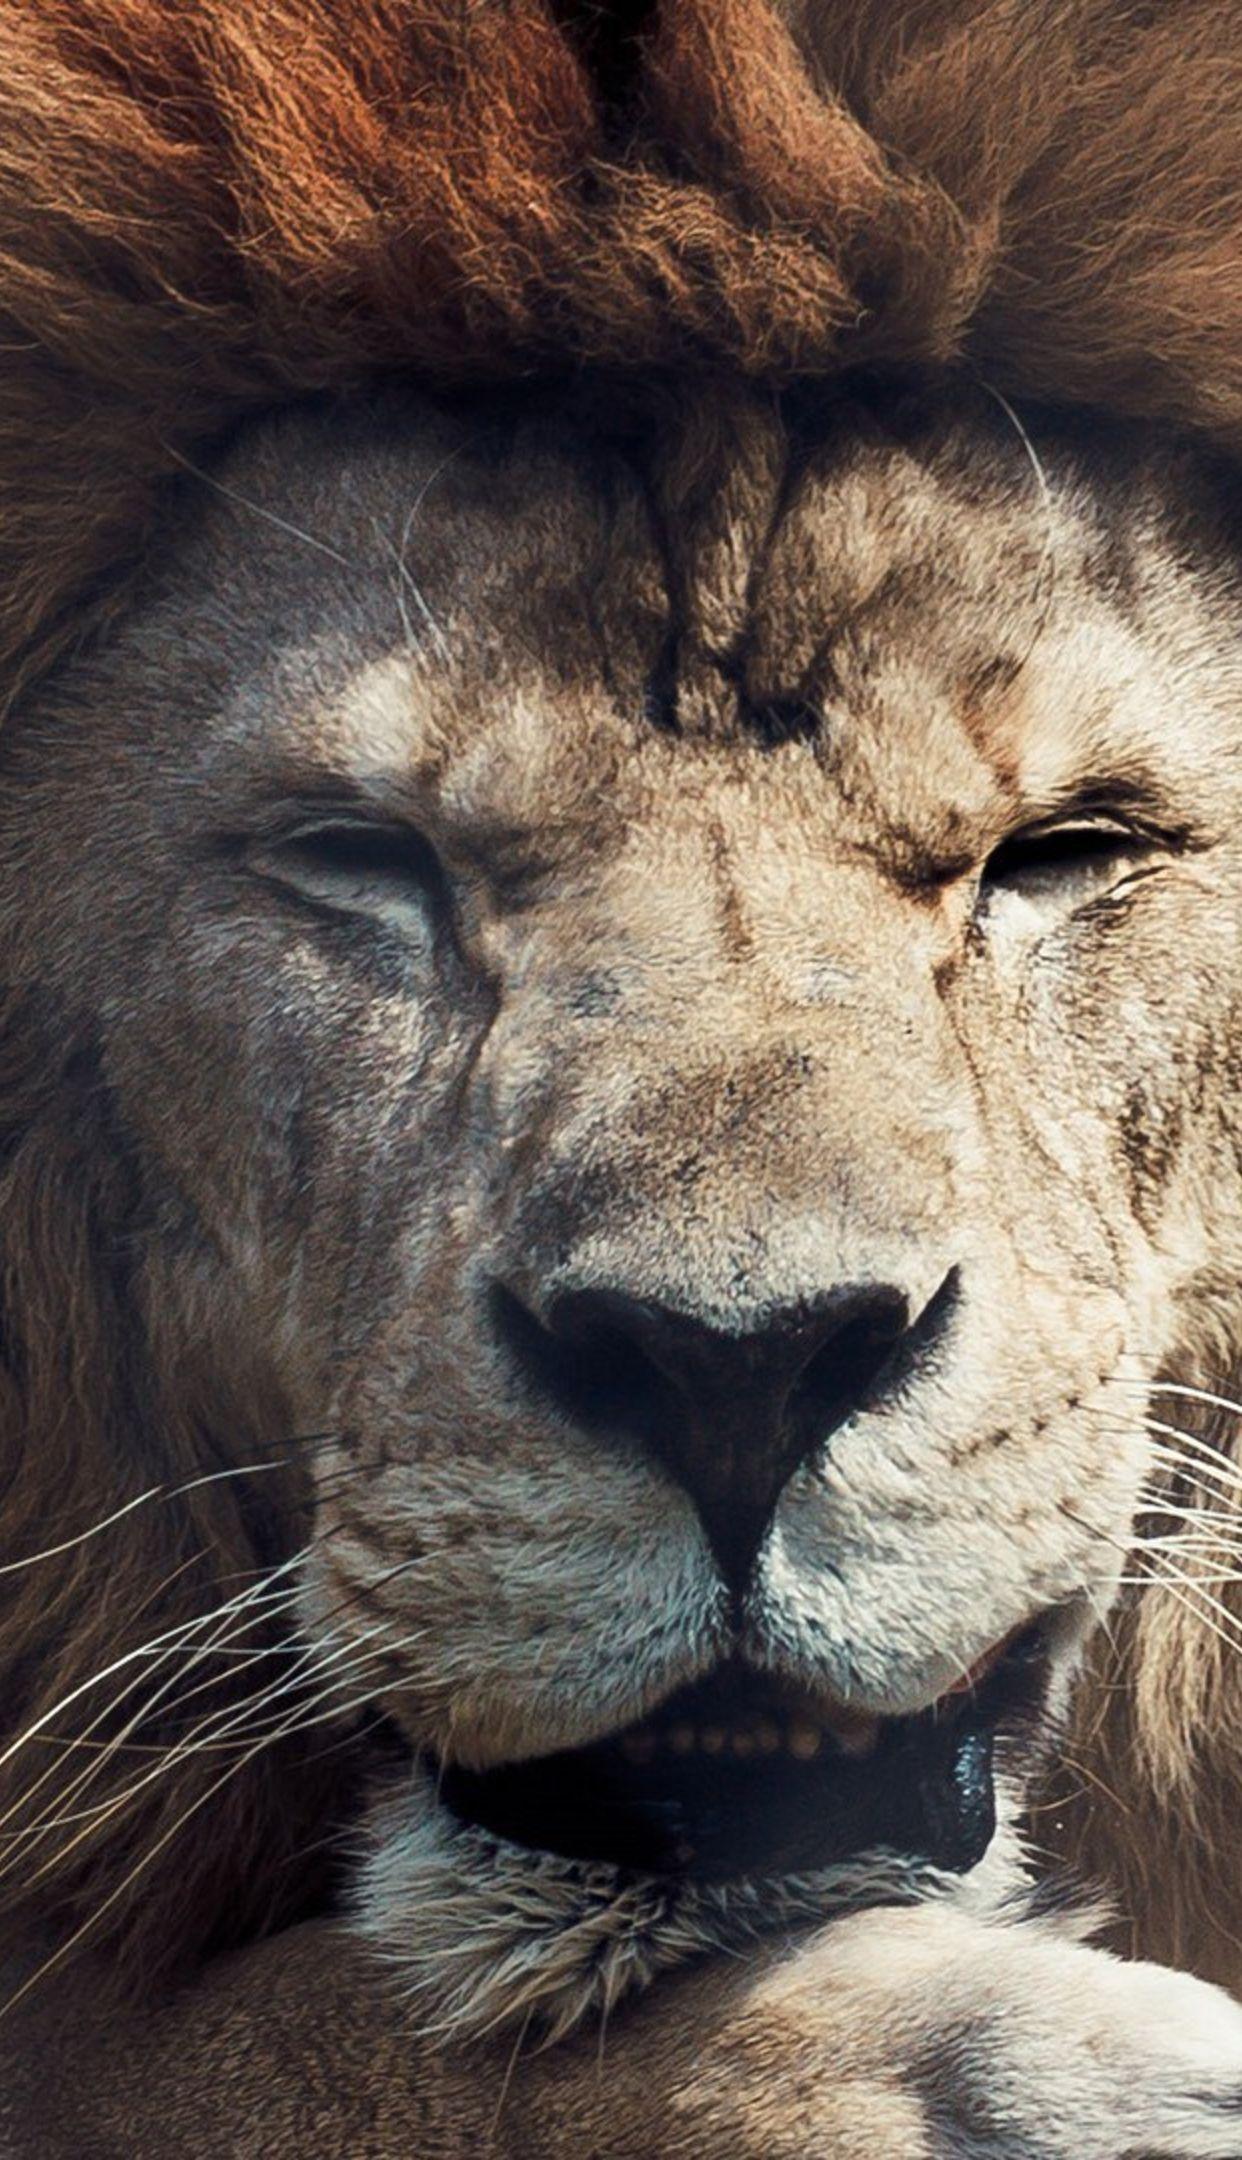 Wallpprs Lion in the zoo 1242x2208 4k HD wallpaper wallpprscom 1242x2160